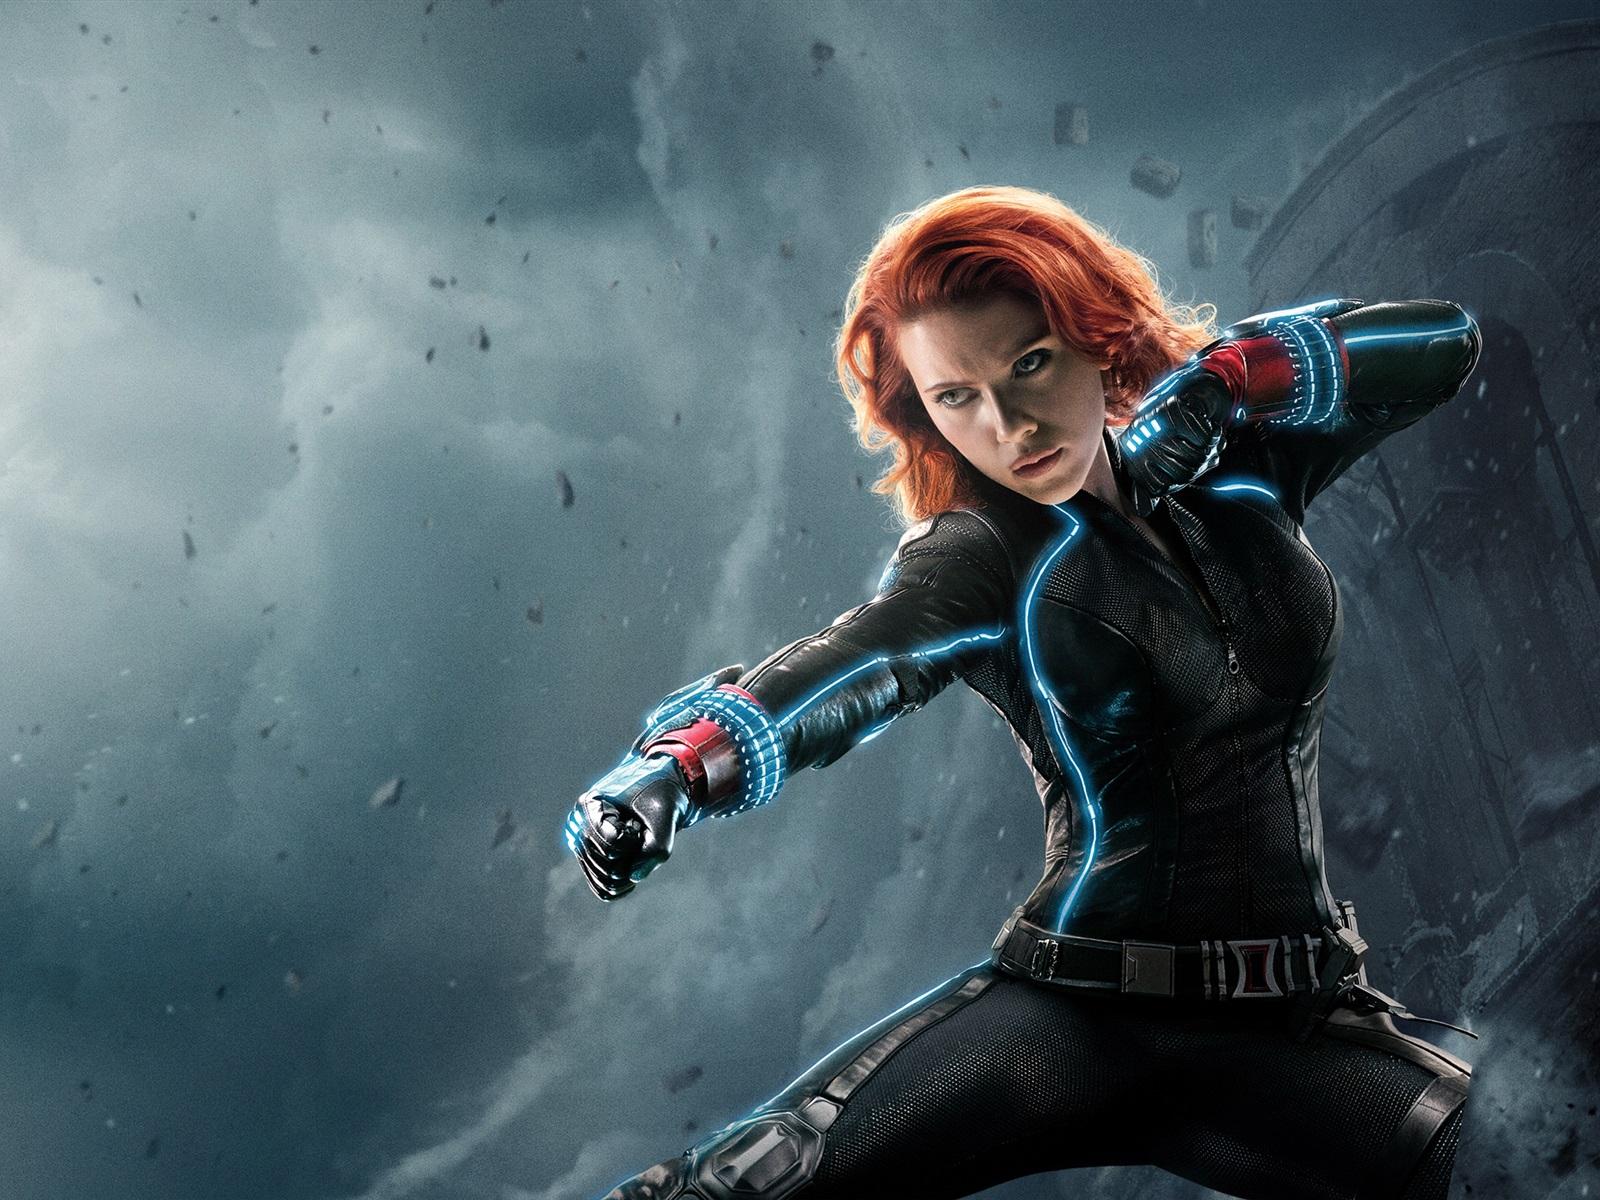 Fonds d 39 cran avengers 2 veuve noire natasha scarlett - Avengers 2 telecharger ...